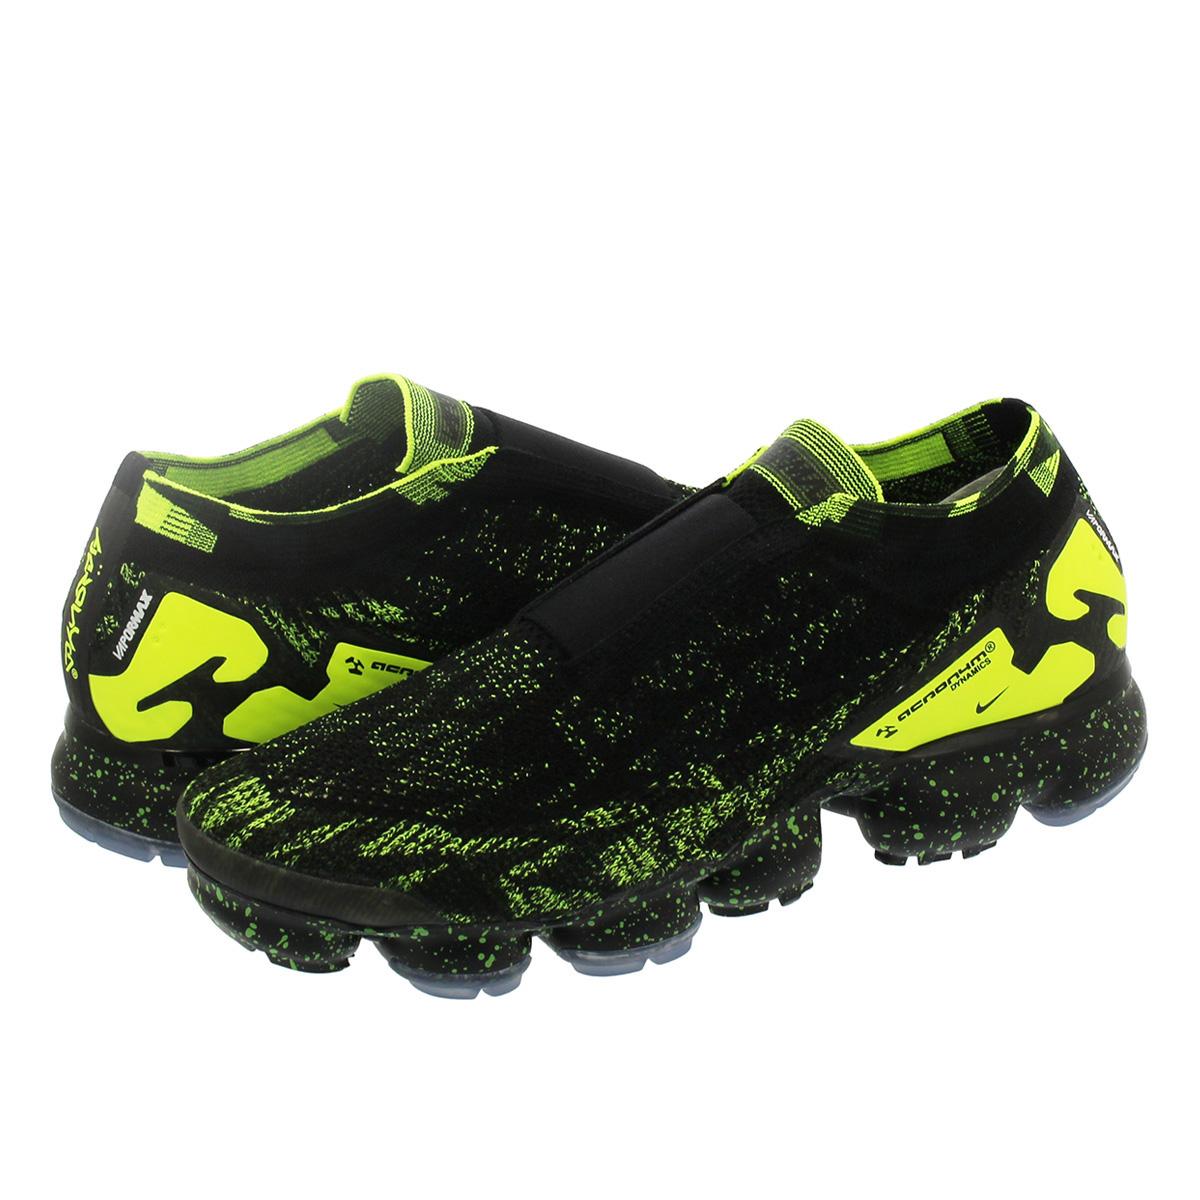 95bccfda944 NIKE X ACRONYM AIR VAPORMAX MOC 2 Nike X アクロニウムエアヴェイパーマックスモック 2 BLACK BLACK VOLT  aq0996-007